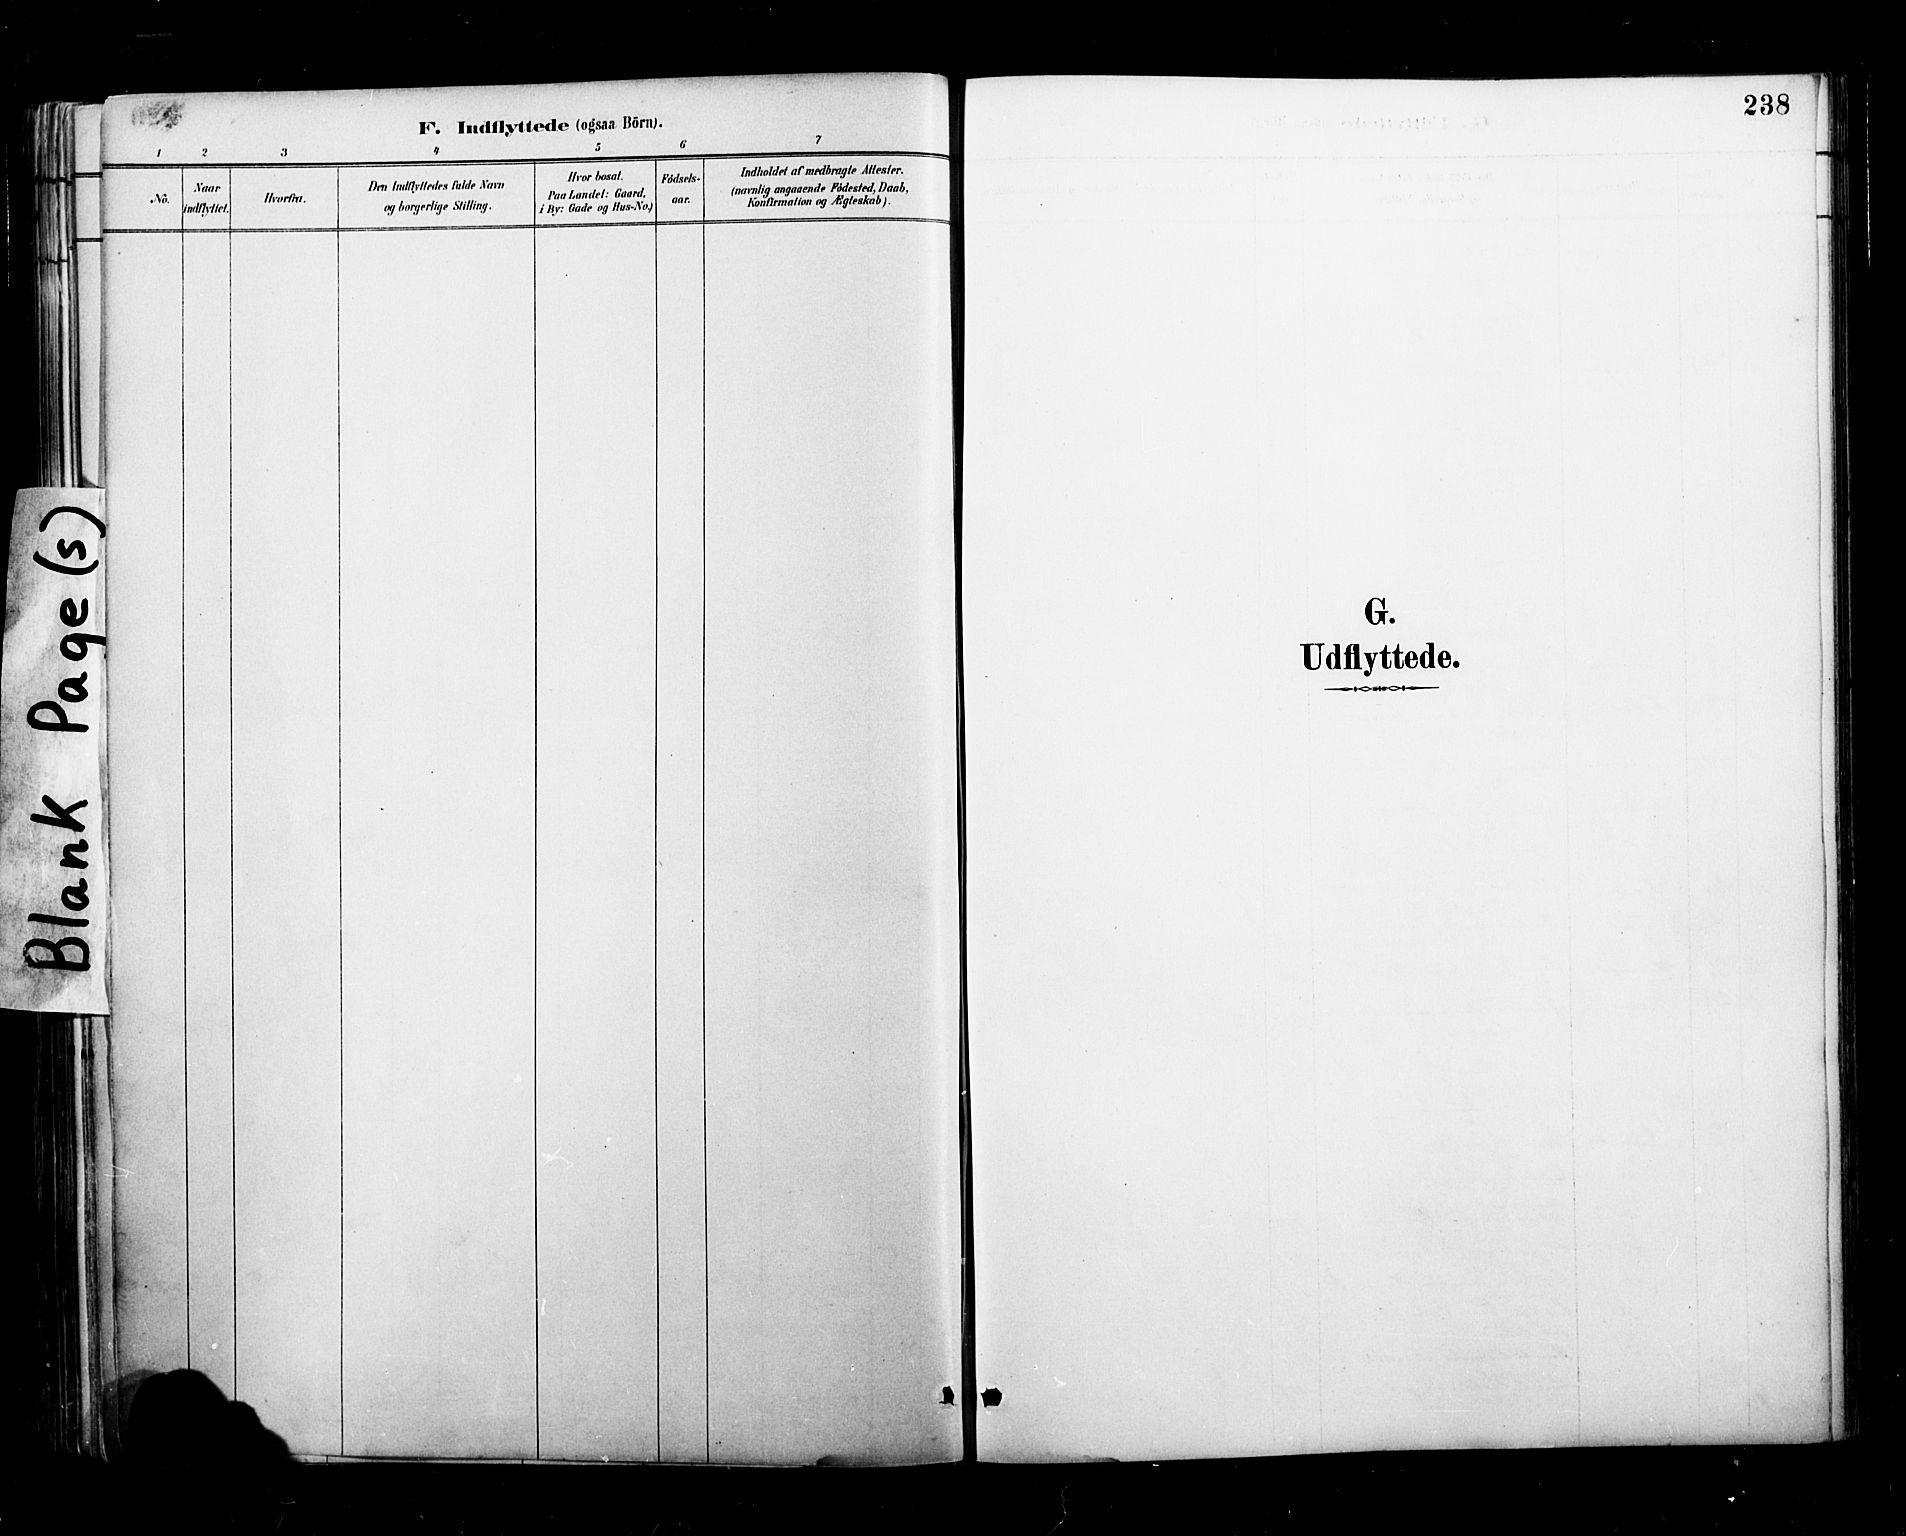 SAT, Ministerialprotokoller, klokkerbøker og fødselsregistre - Nordland, 827/L0401: Ministerialbok nr. 827A13, 1887-1905, s. 238